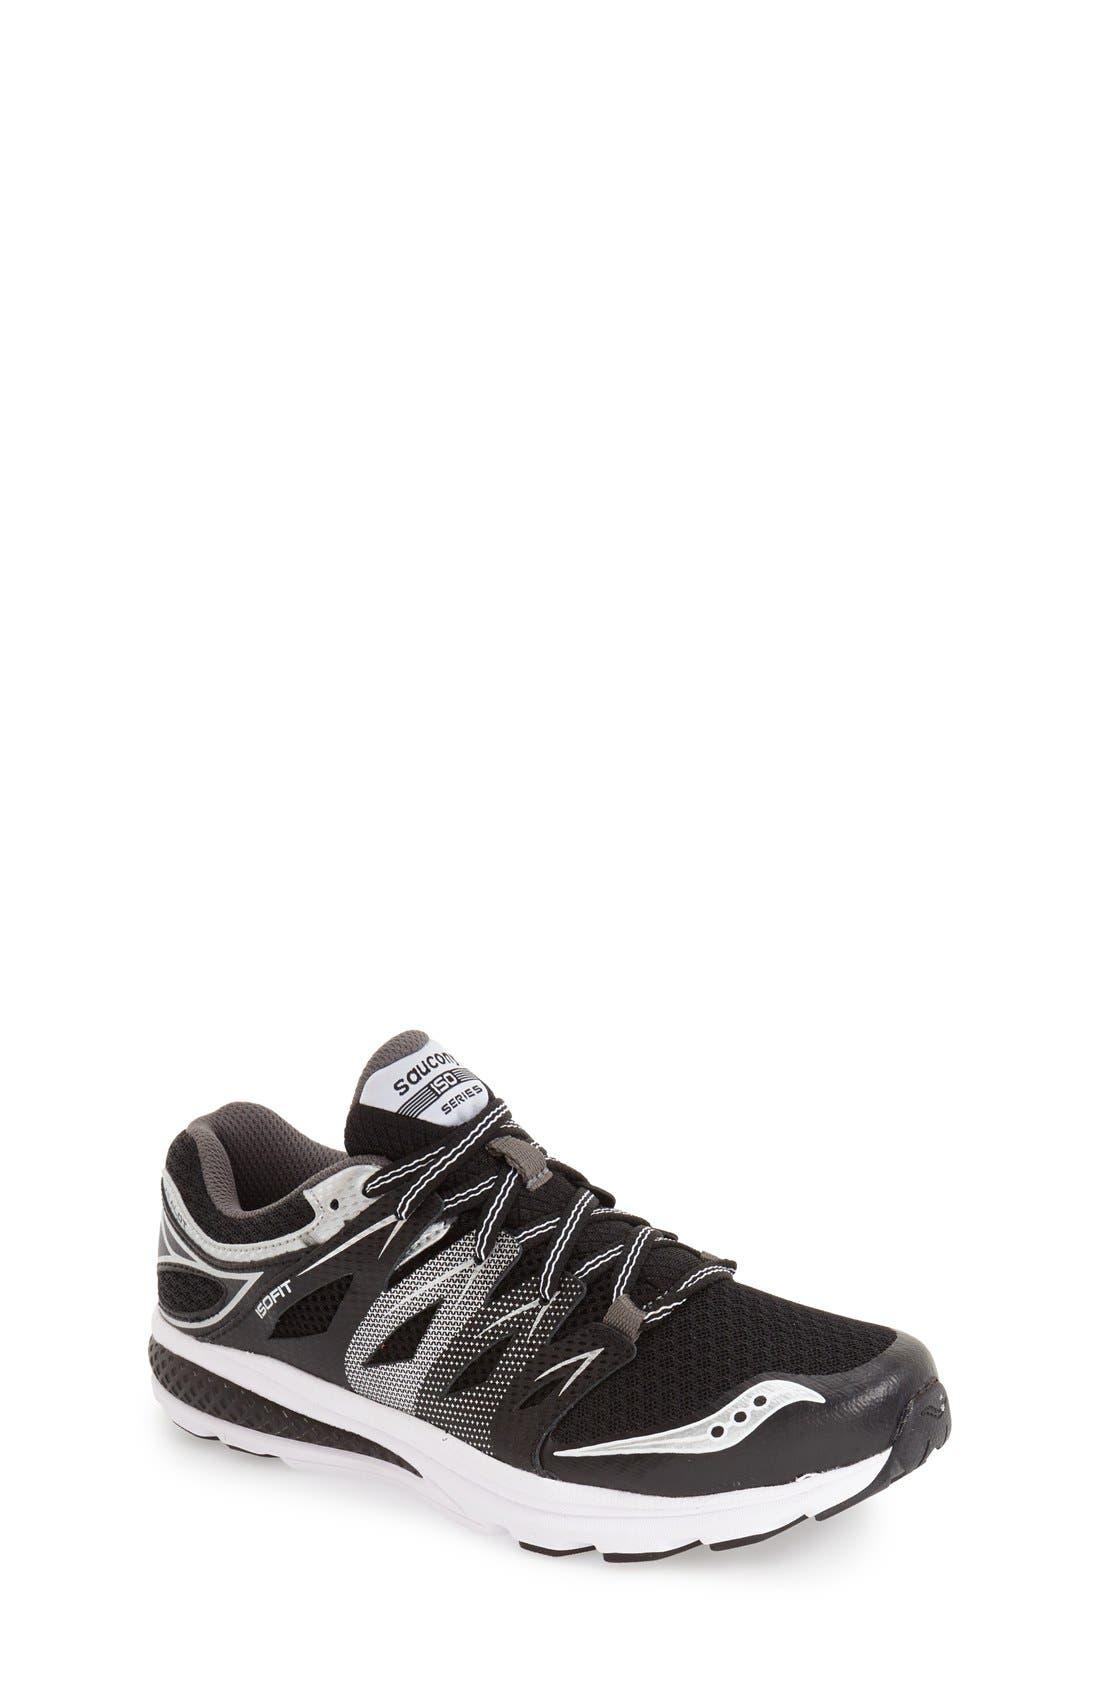 'Zealot 2' Athletic Shoe,                             Main thumbnail 1, color,